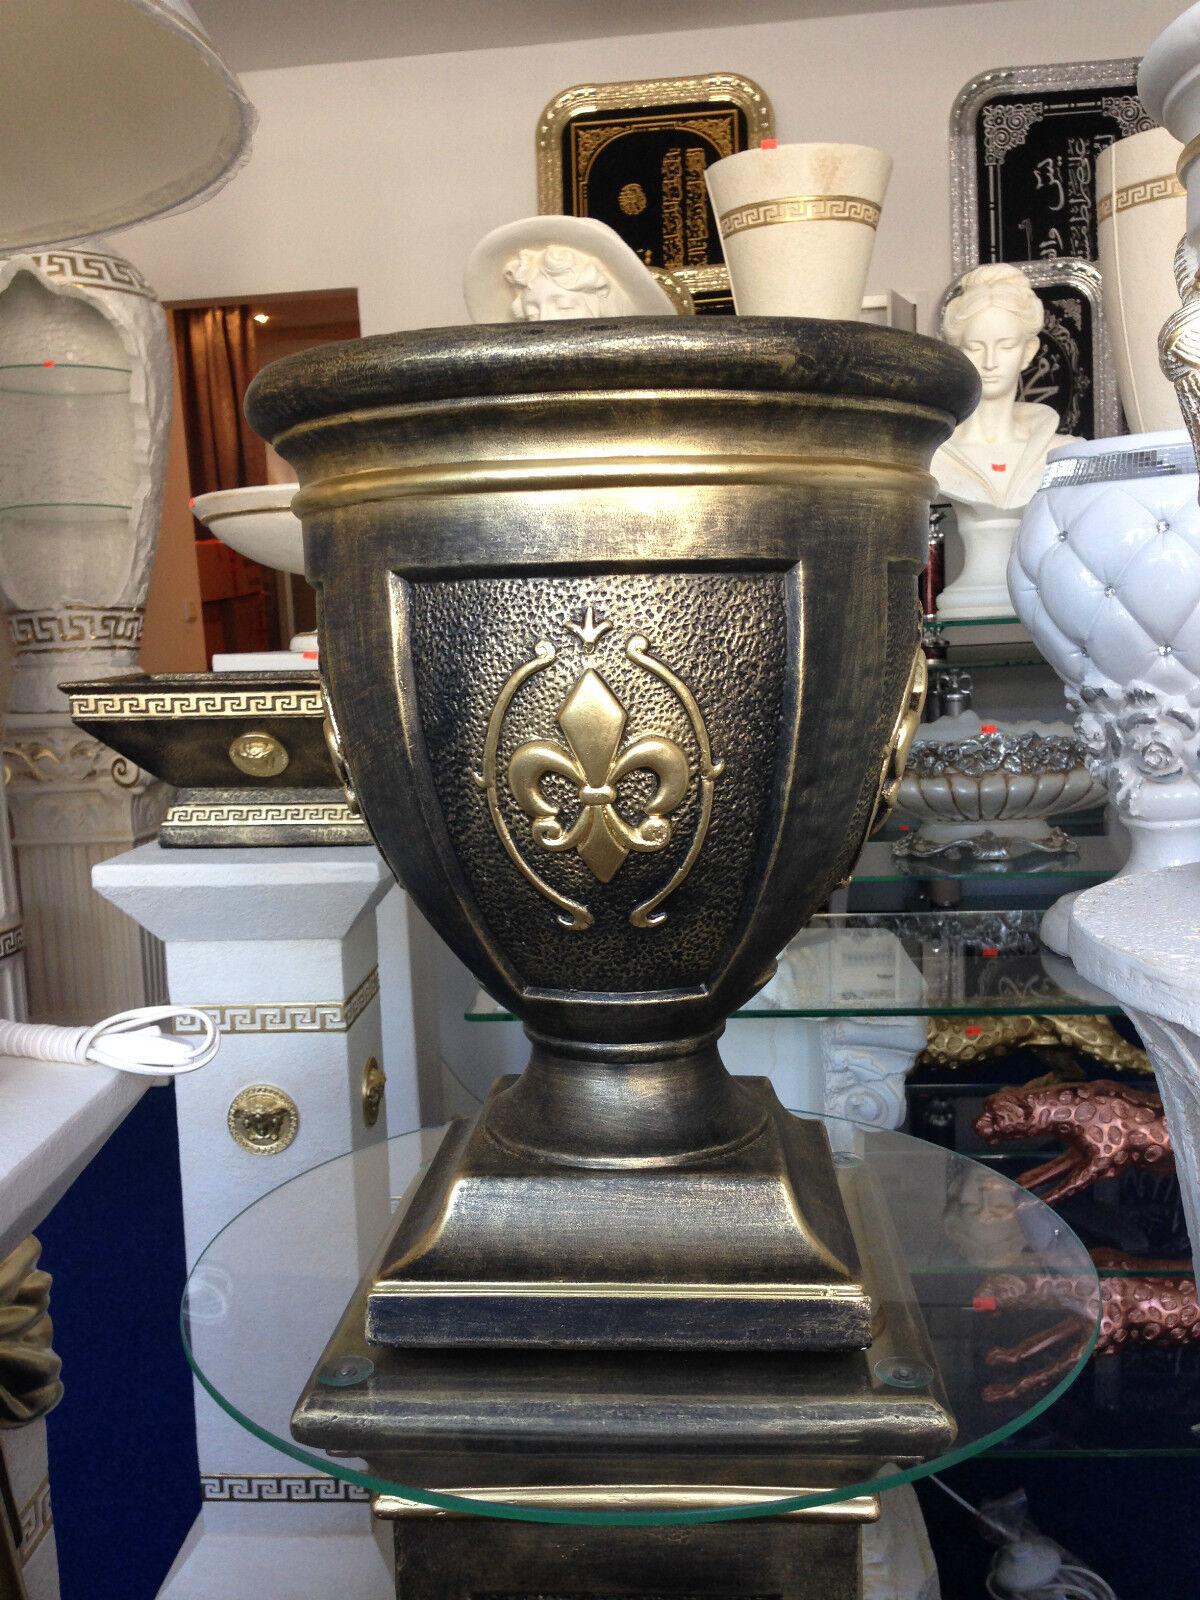 Medusa Schale Blaumenkübel Vase Barock Blaumenvasen lilifee mit Style 0865 k 110